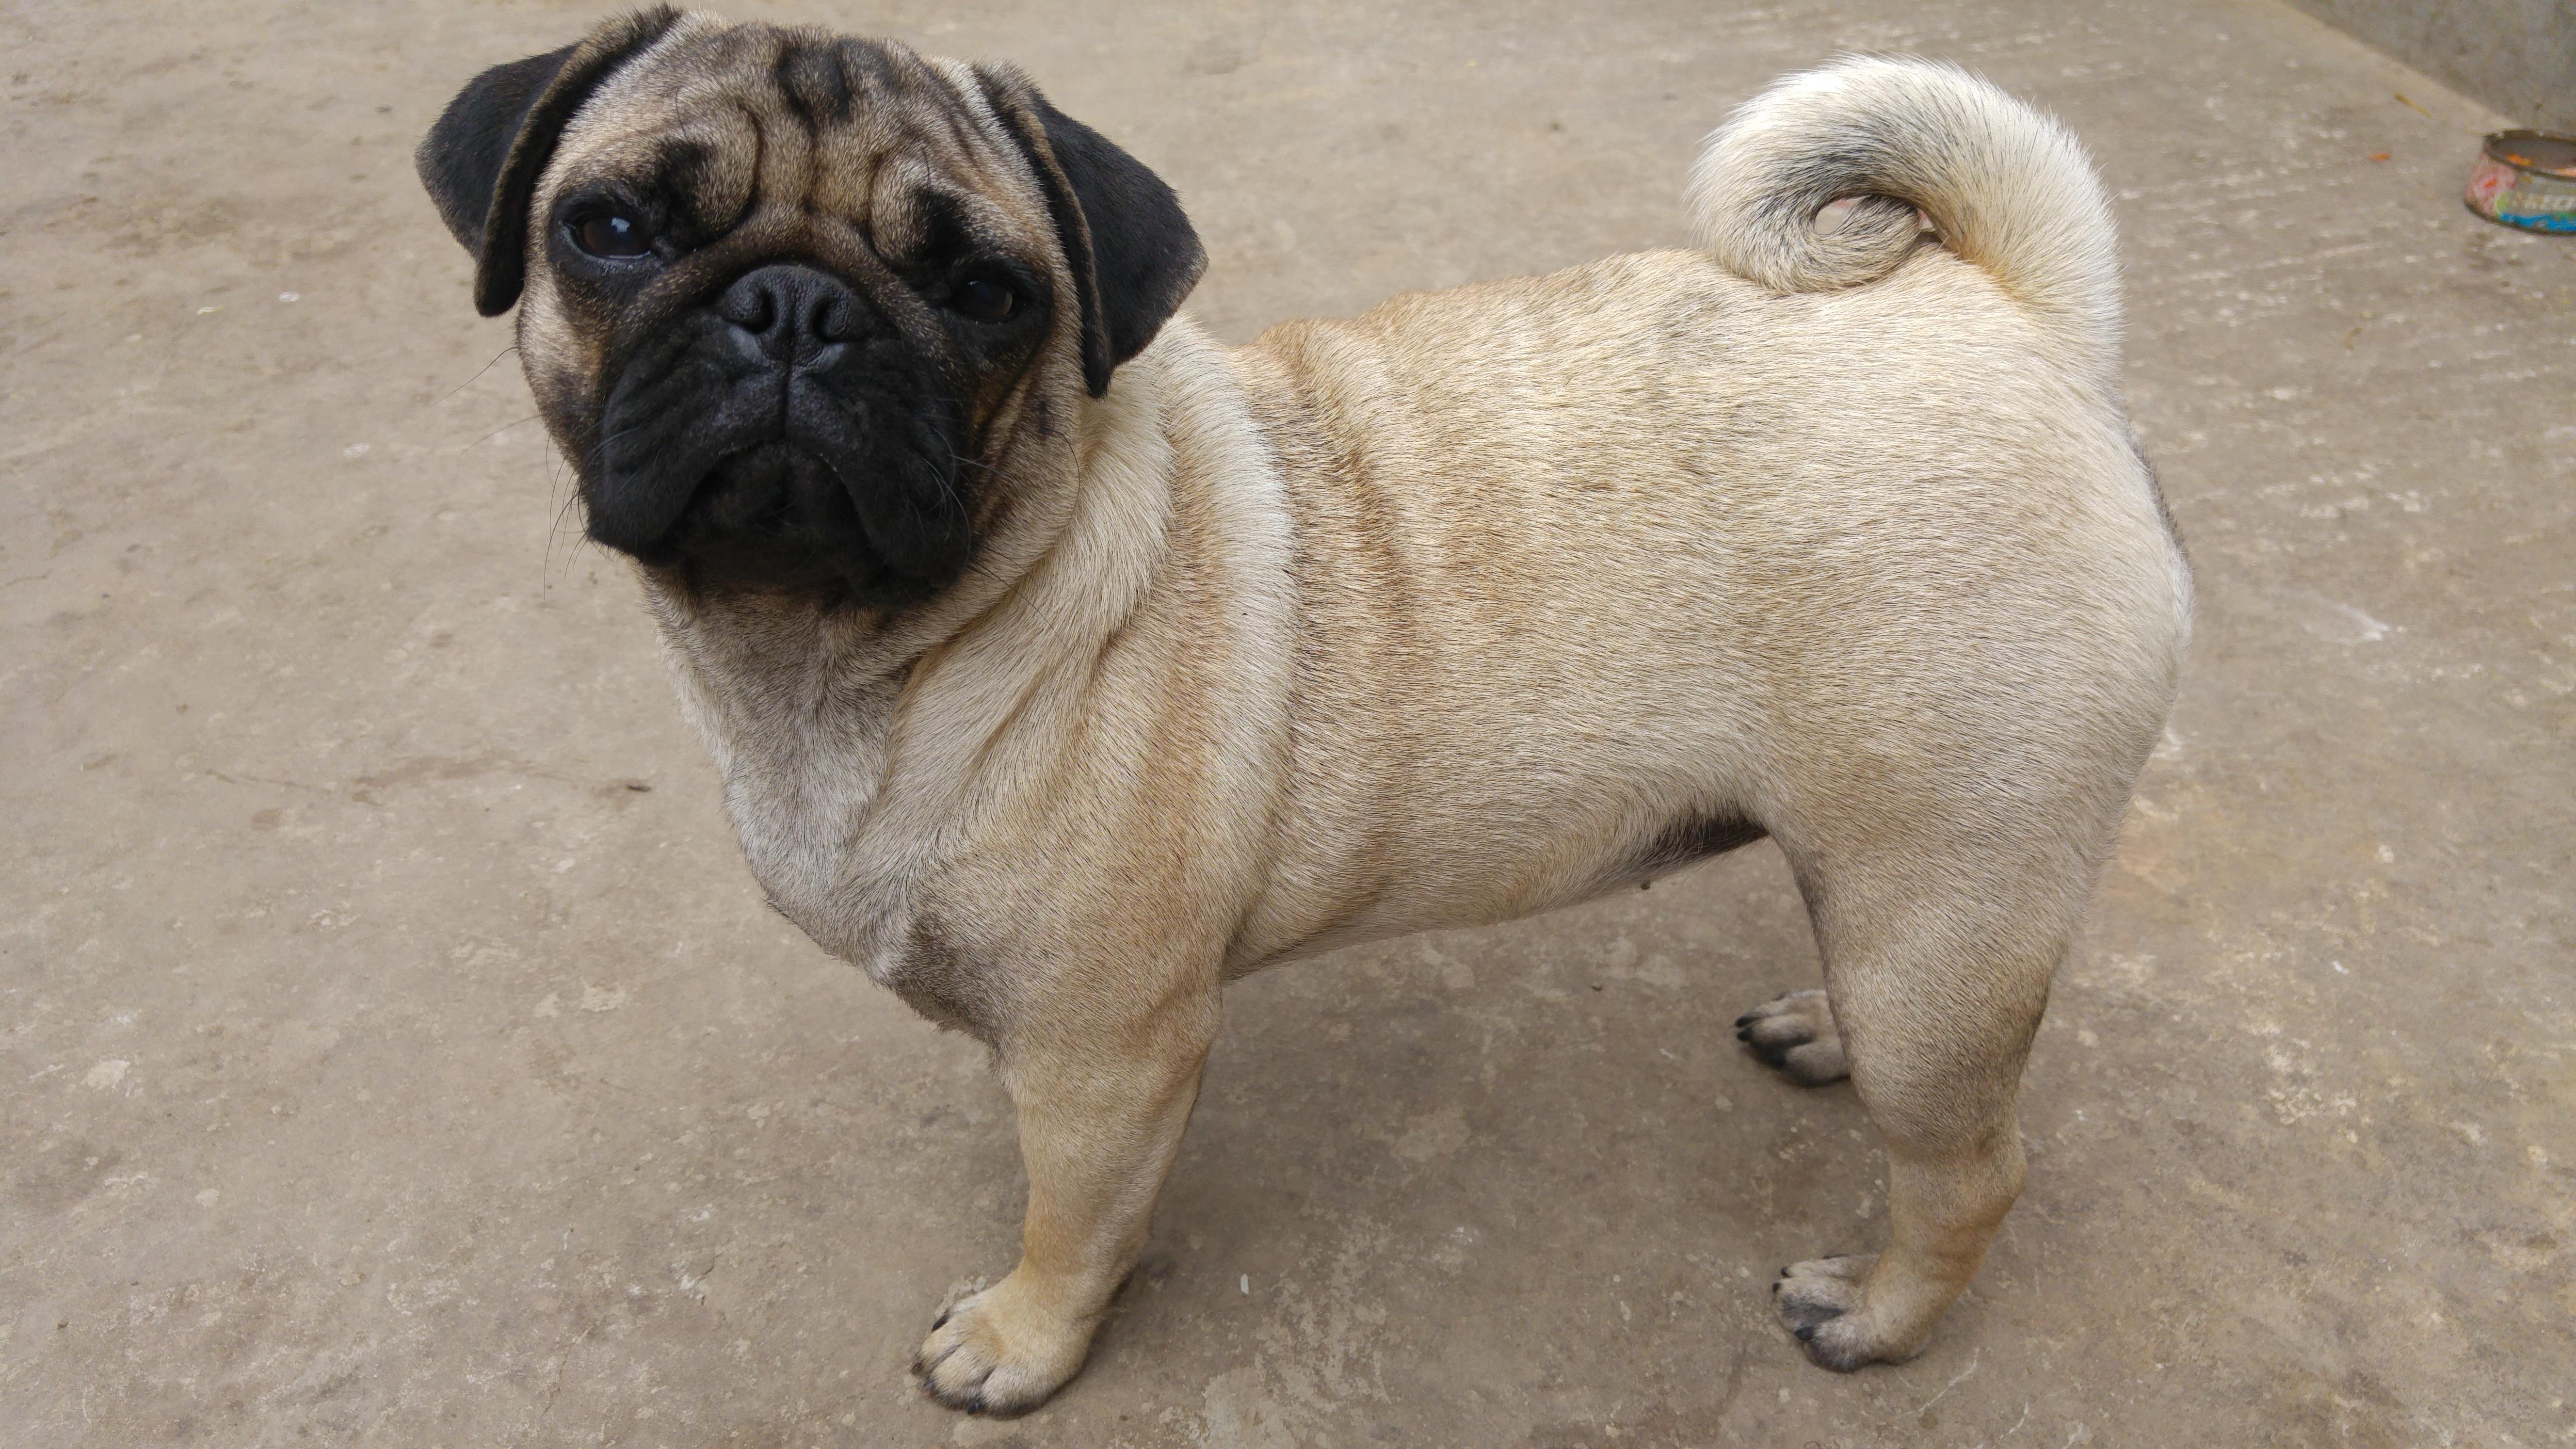 Free Images : Pug, Pets, Dogs, Animals, Vertebrate, Dog